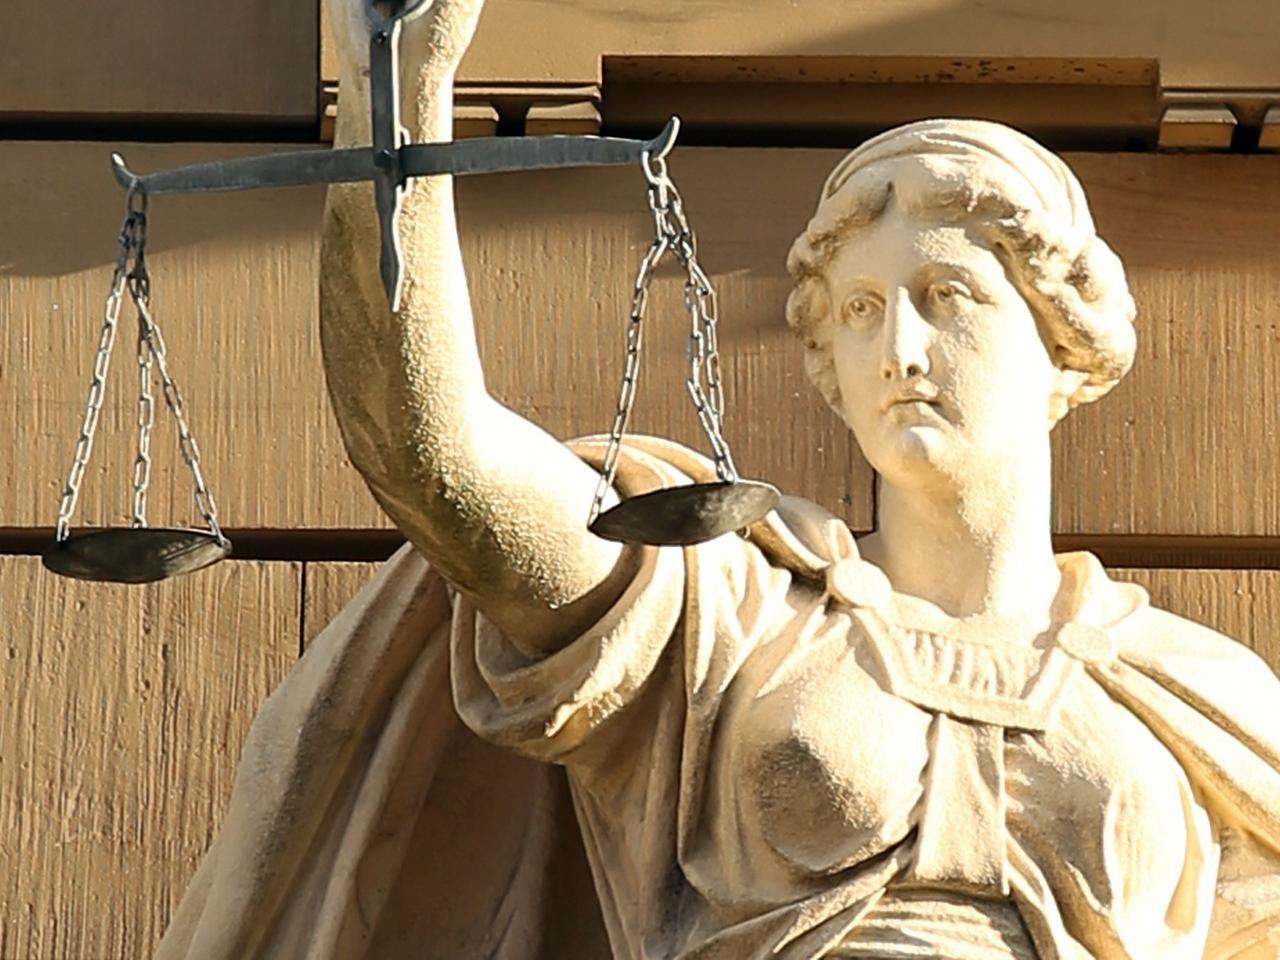 26-Jähriger aus Goslar muss ins Gefängnis